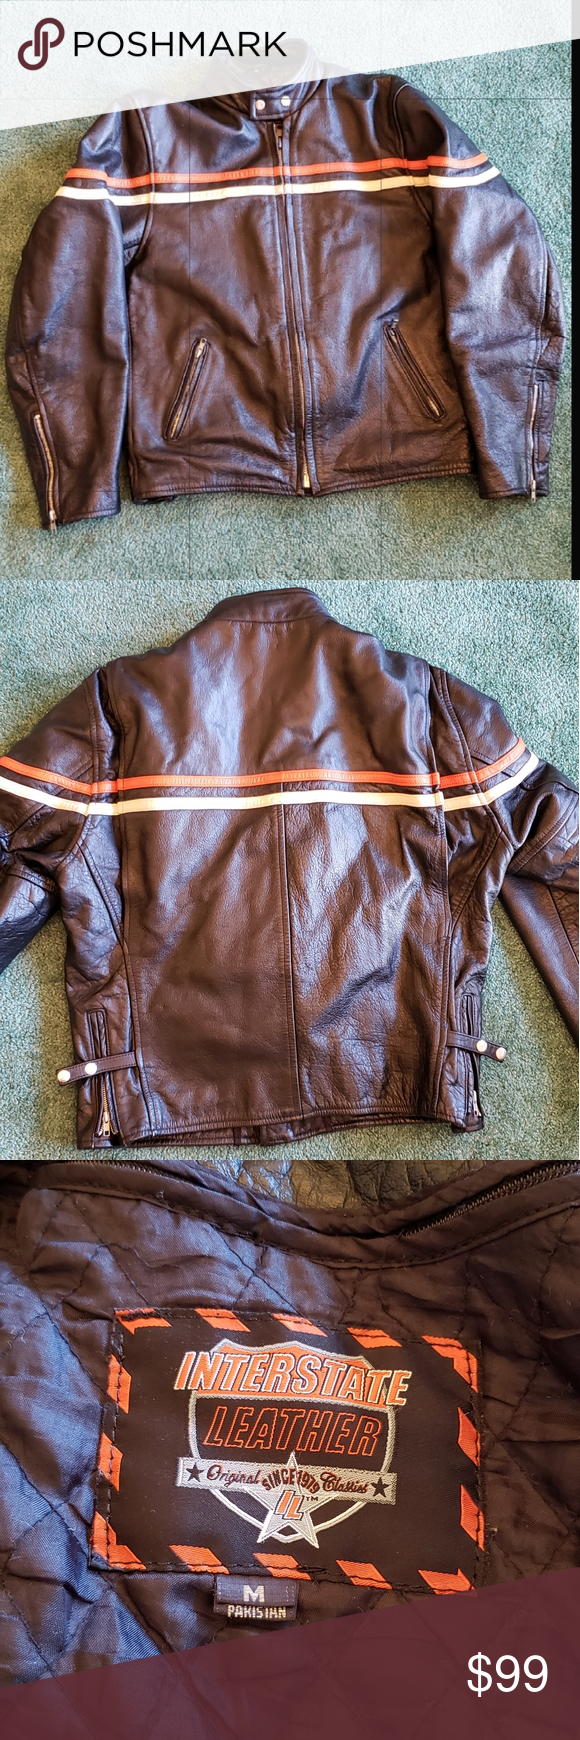 Interstate Leather Biker Jacket Sz Medium Leather Biker Jacket Biker Jacket Leather [ 1740 x 580 Pixel ]